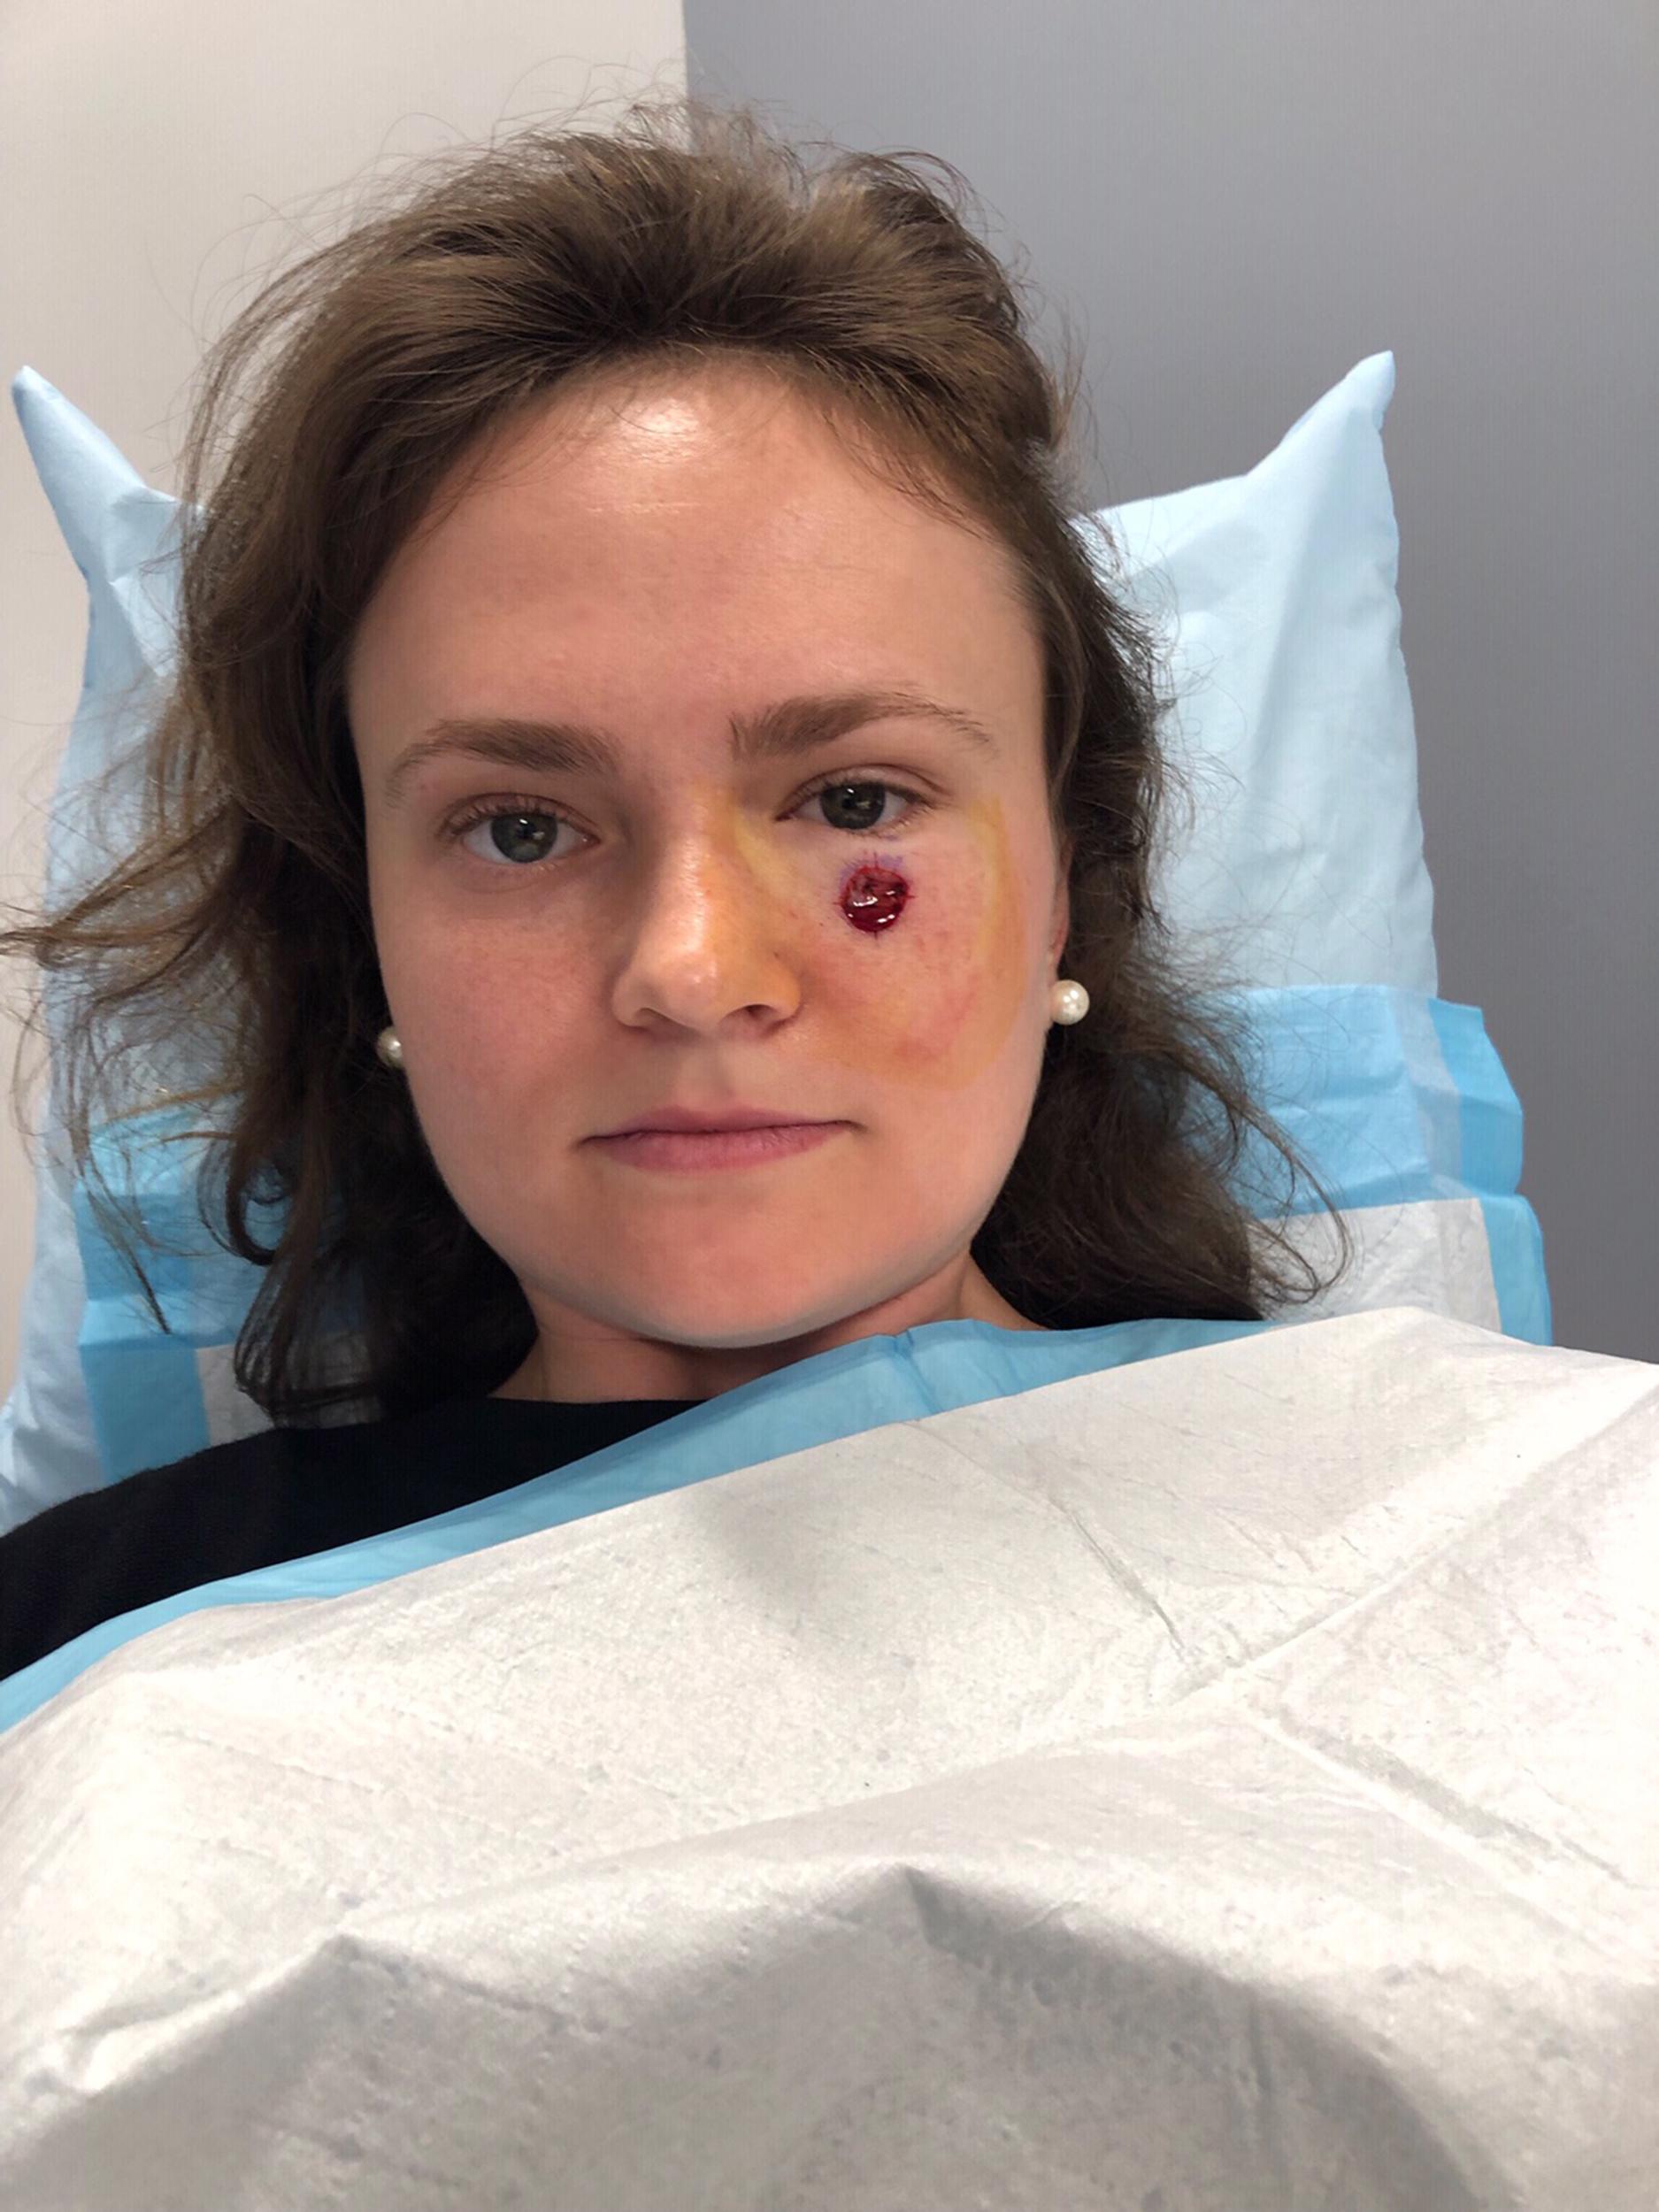 Skin Cancer Woman Discovers Basal Cell Carcinoma Near Eye